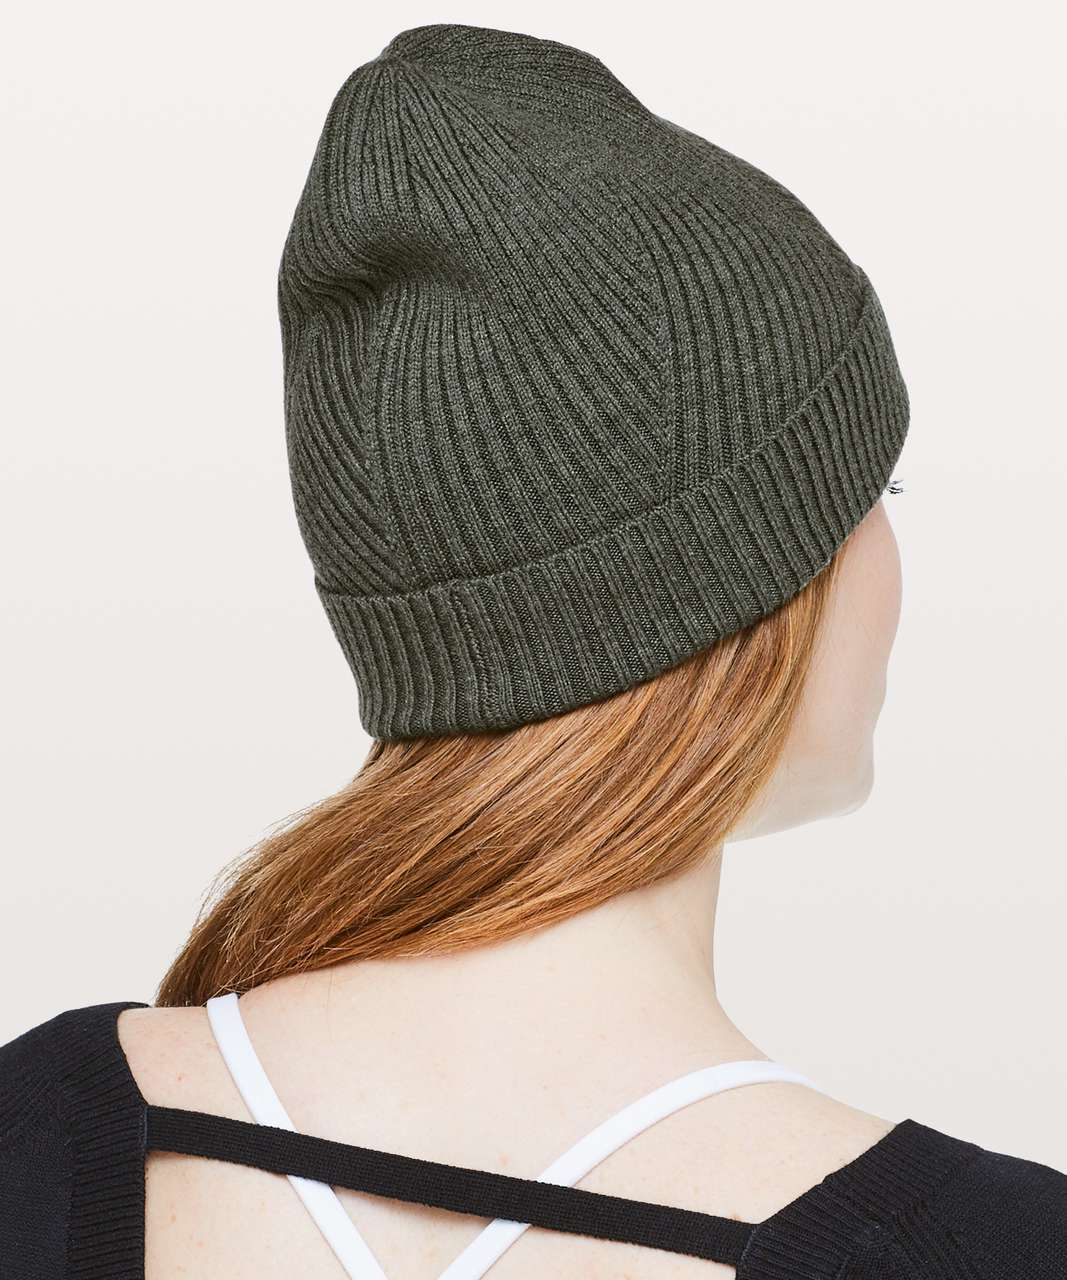 ce7c92920 Lululemon Twist Of Cozy Knit Beanie - Heathered Camo Green